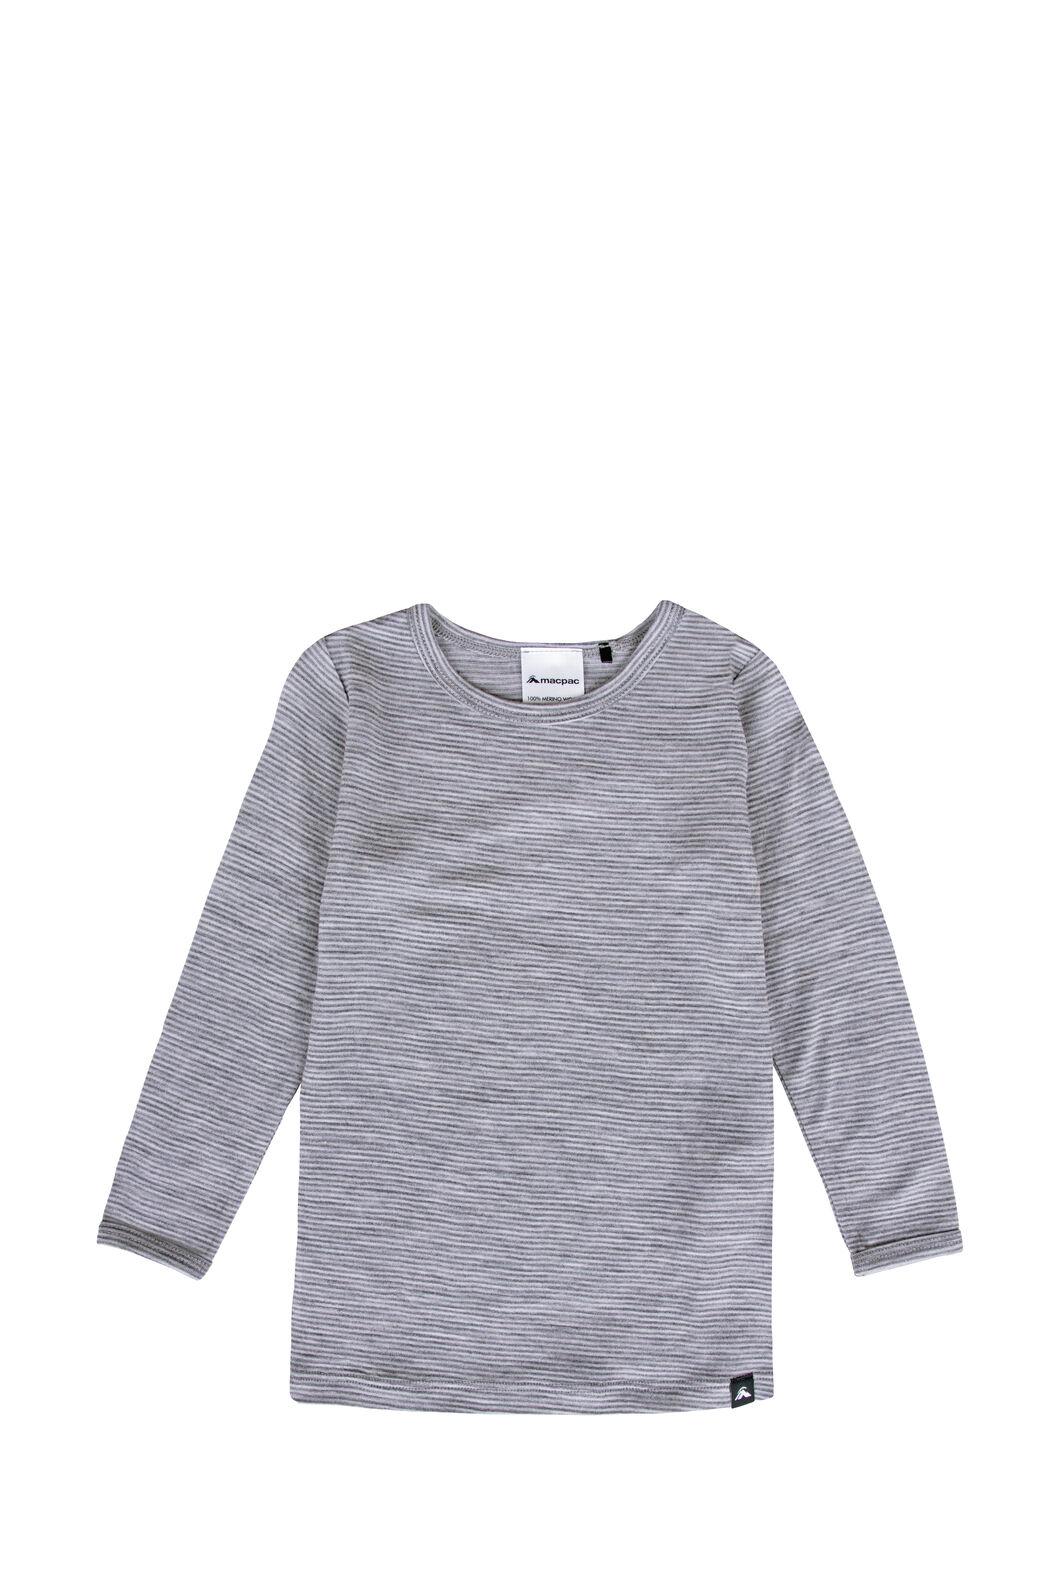 Macpac 150 Merino Long Sleeve Top — Baby, Light Grey Stripe, hi-res